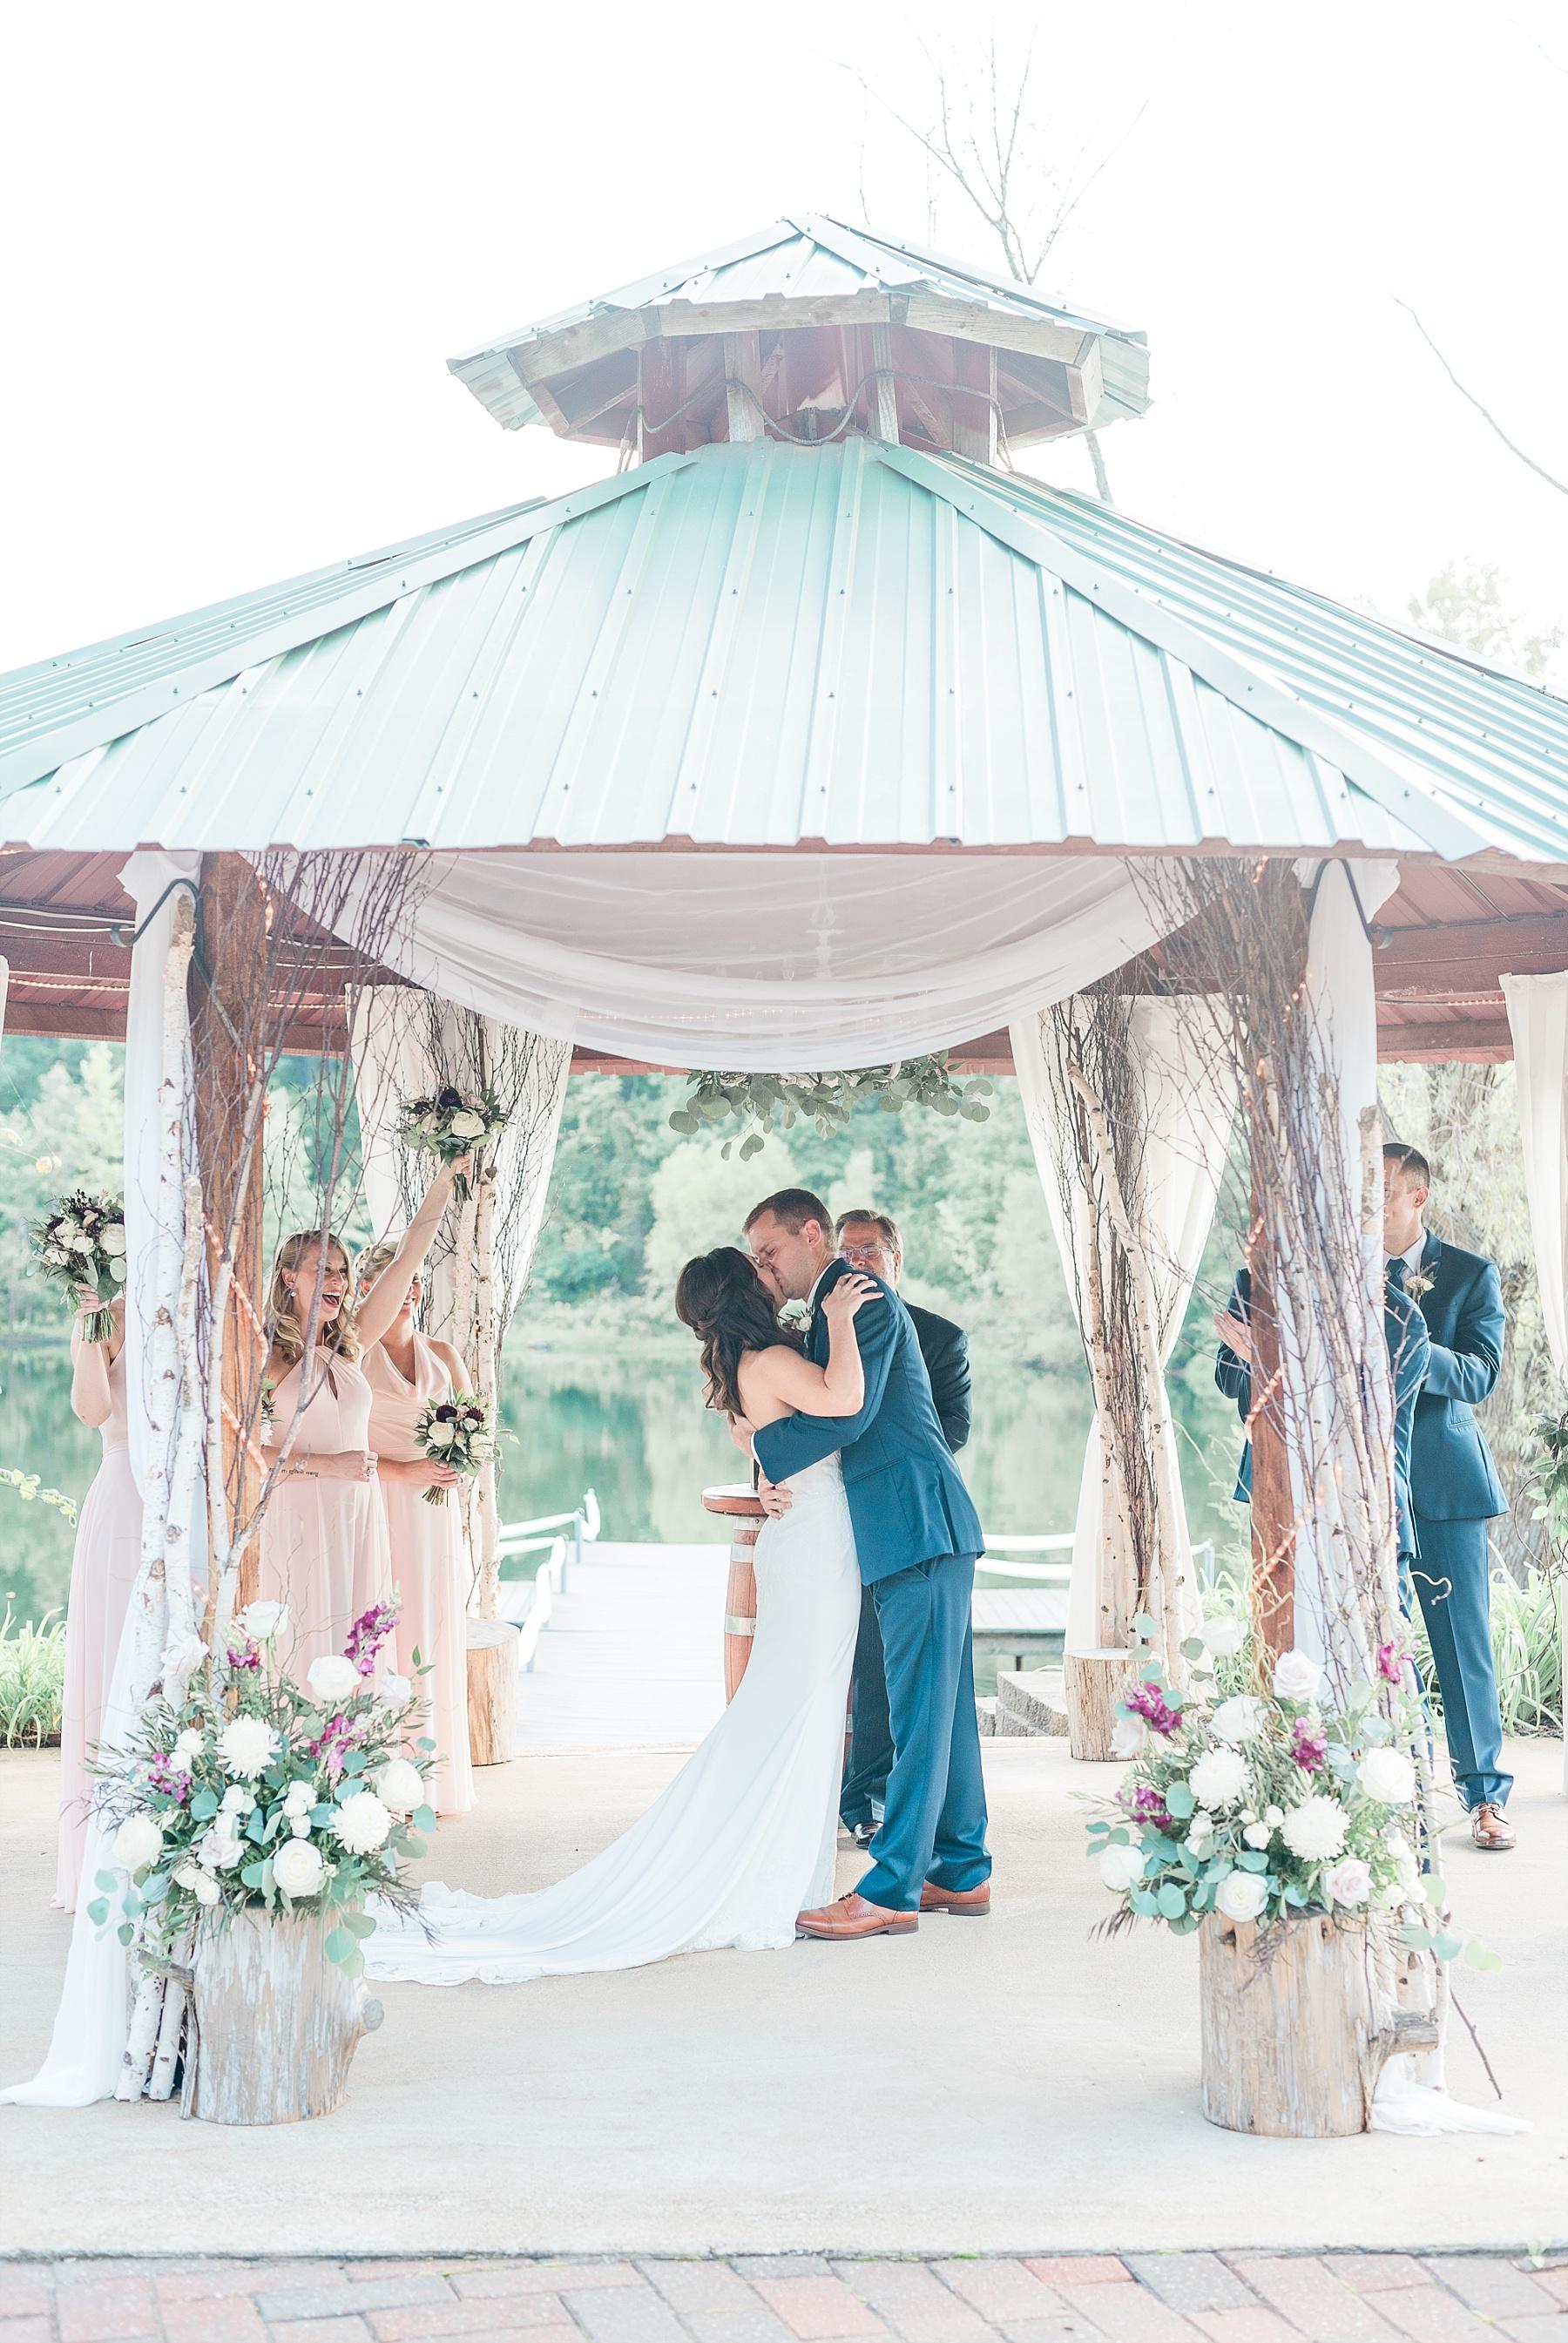 Romantic Summer Sunset Wedding Ceremony at Little Piney Lodge St. Louis Missouri by Kelsi Kliethermes Photography Fine Art Photographer_0058.jpg